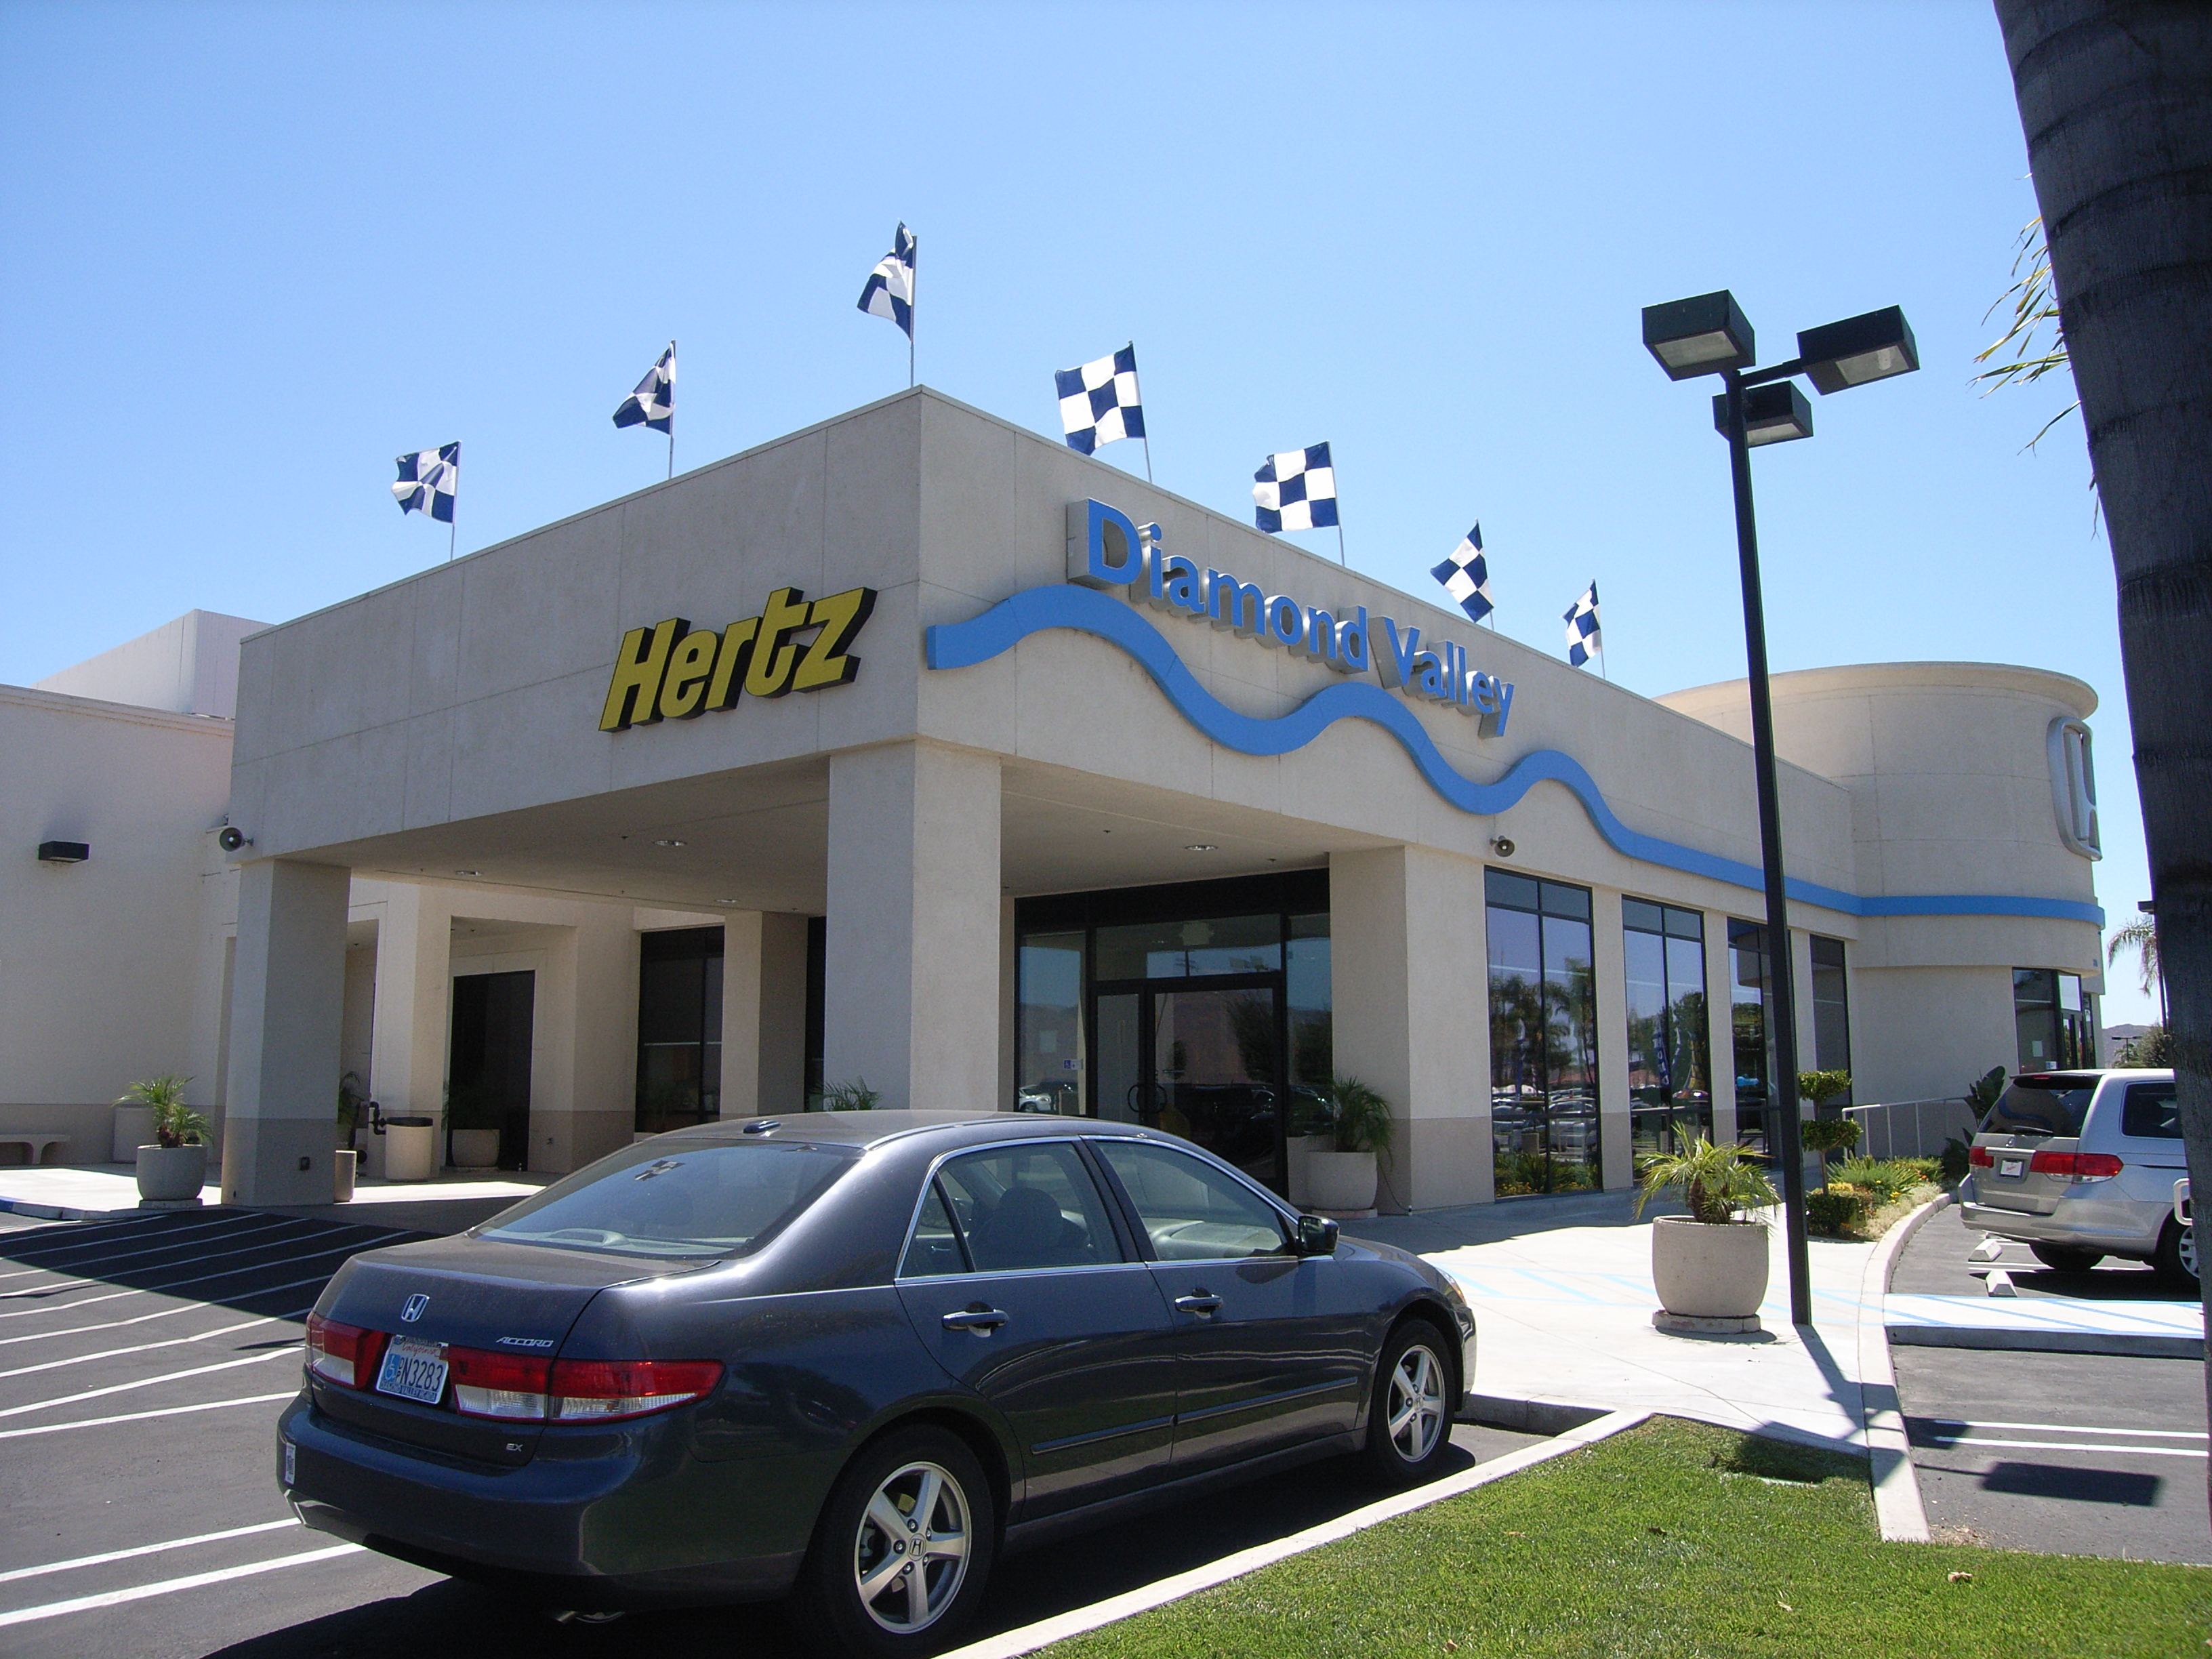 Diamond valley honda in hemet ca auto dealers yellow for Valley honda dealers